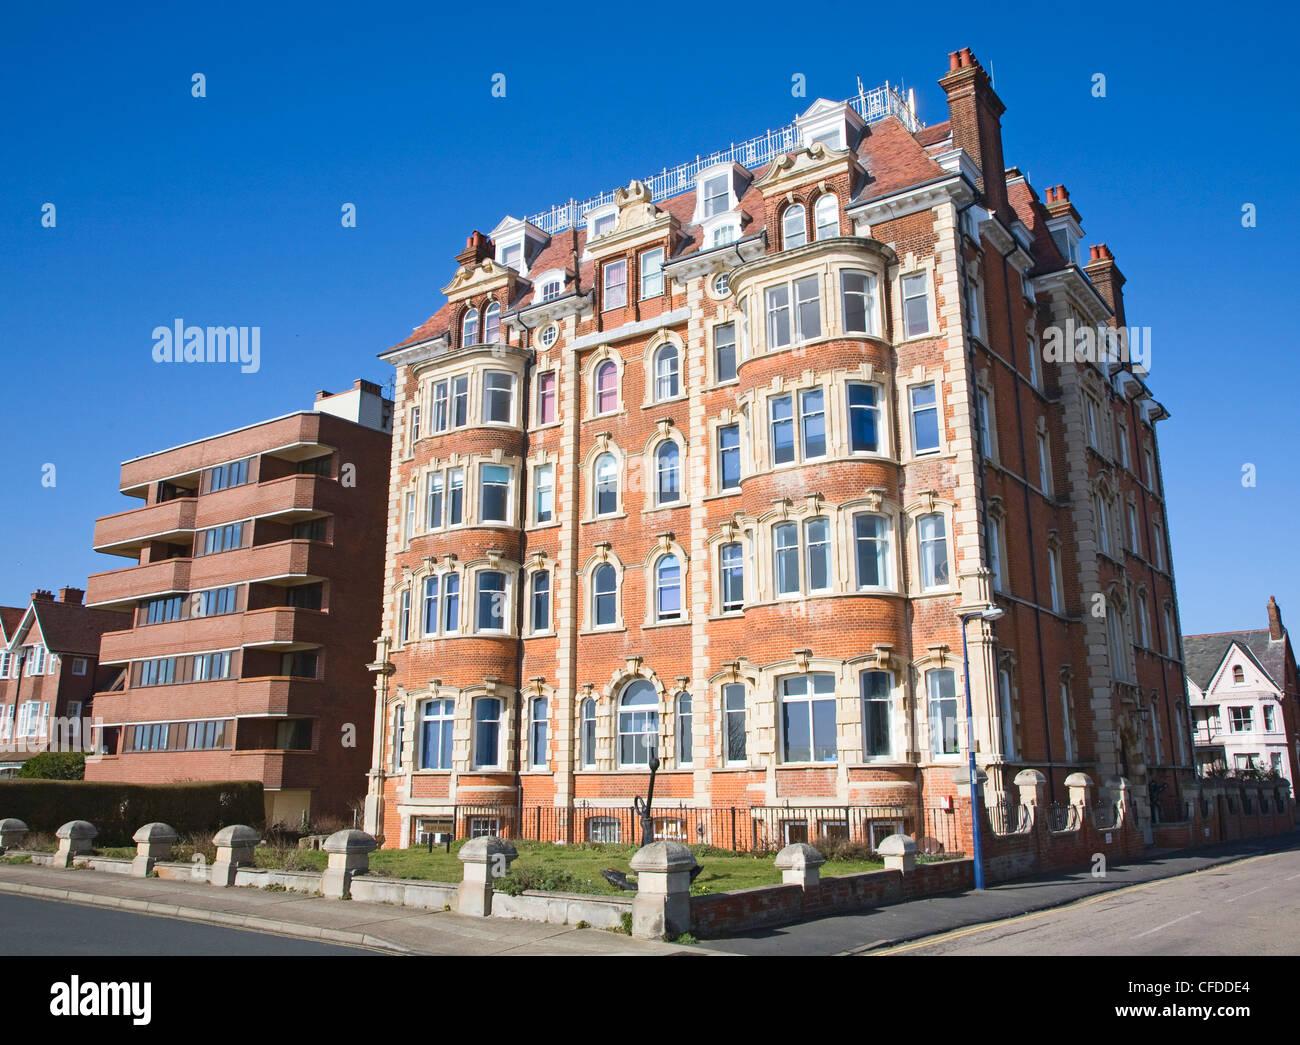 Cliff House Edwardian or Victorian building, Hamilton Gardens, Felixstowe, Suffolk, England - Stock Image